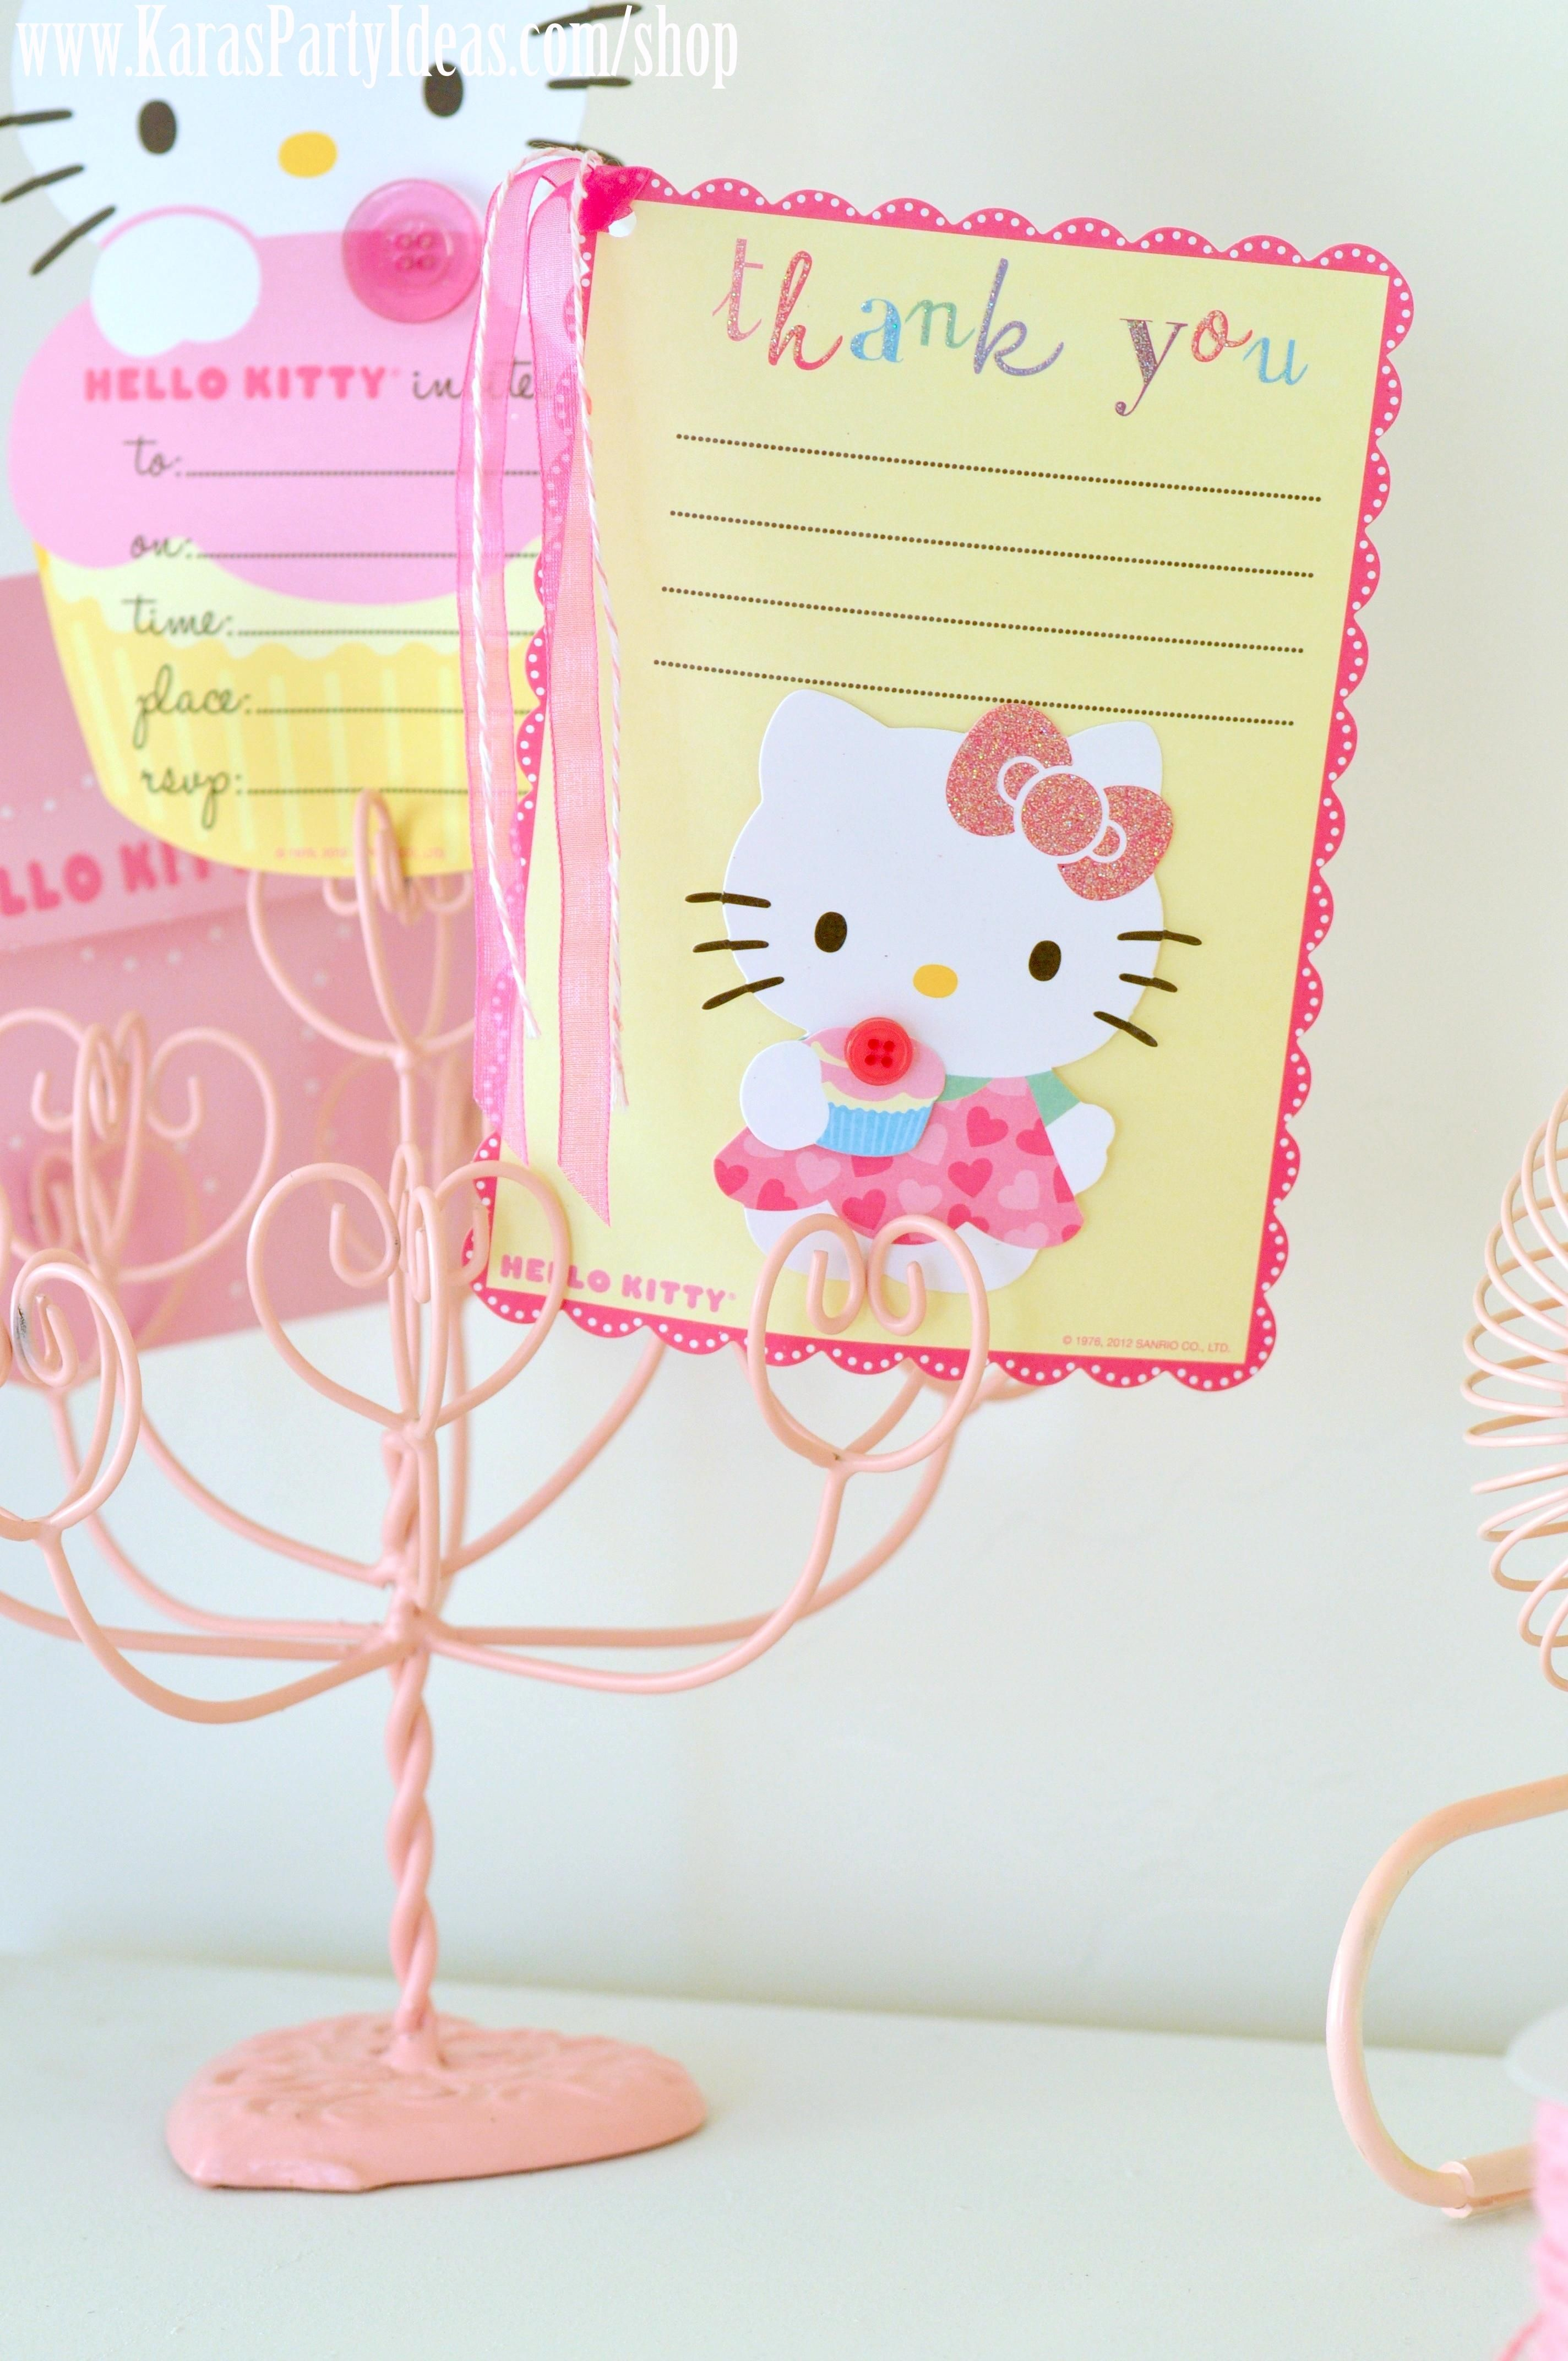 bc4dd063f hello kitty party | Hello Kitty Birthday Party Planning Cupcakes  Decorations Kara's Party .